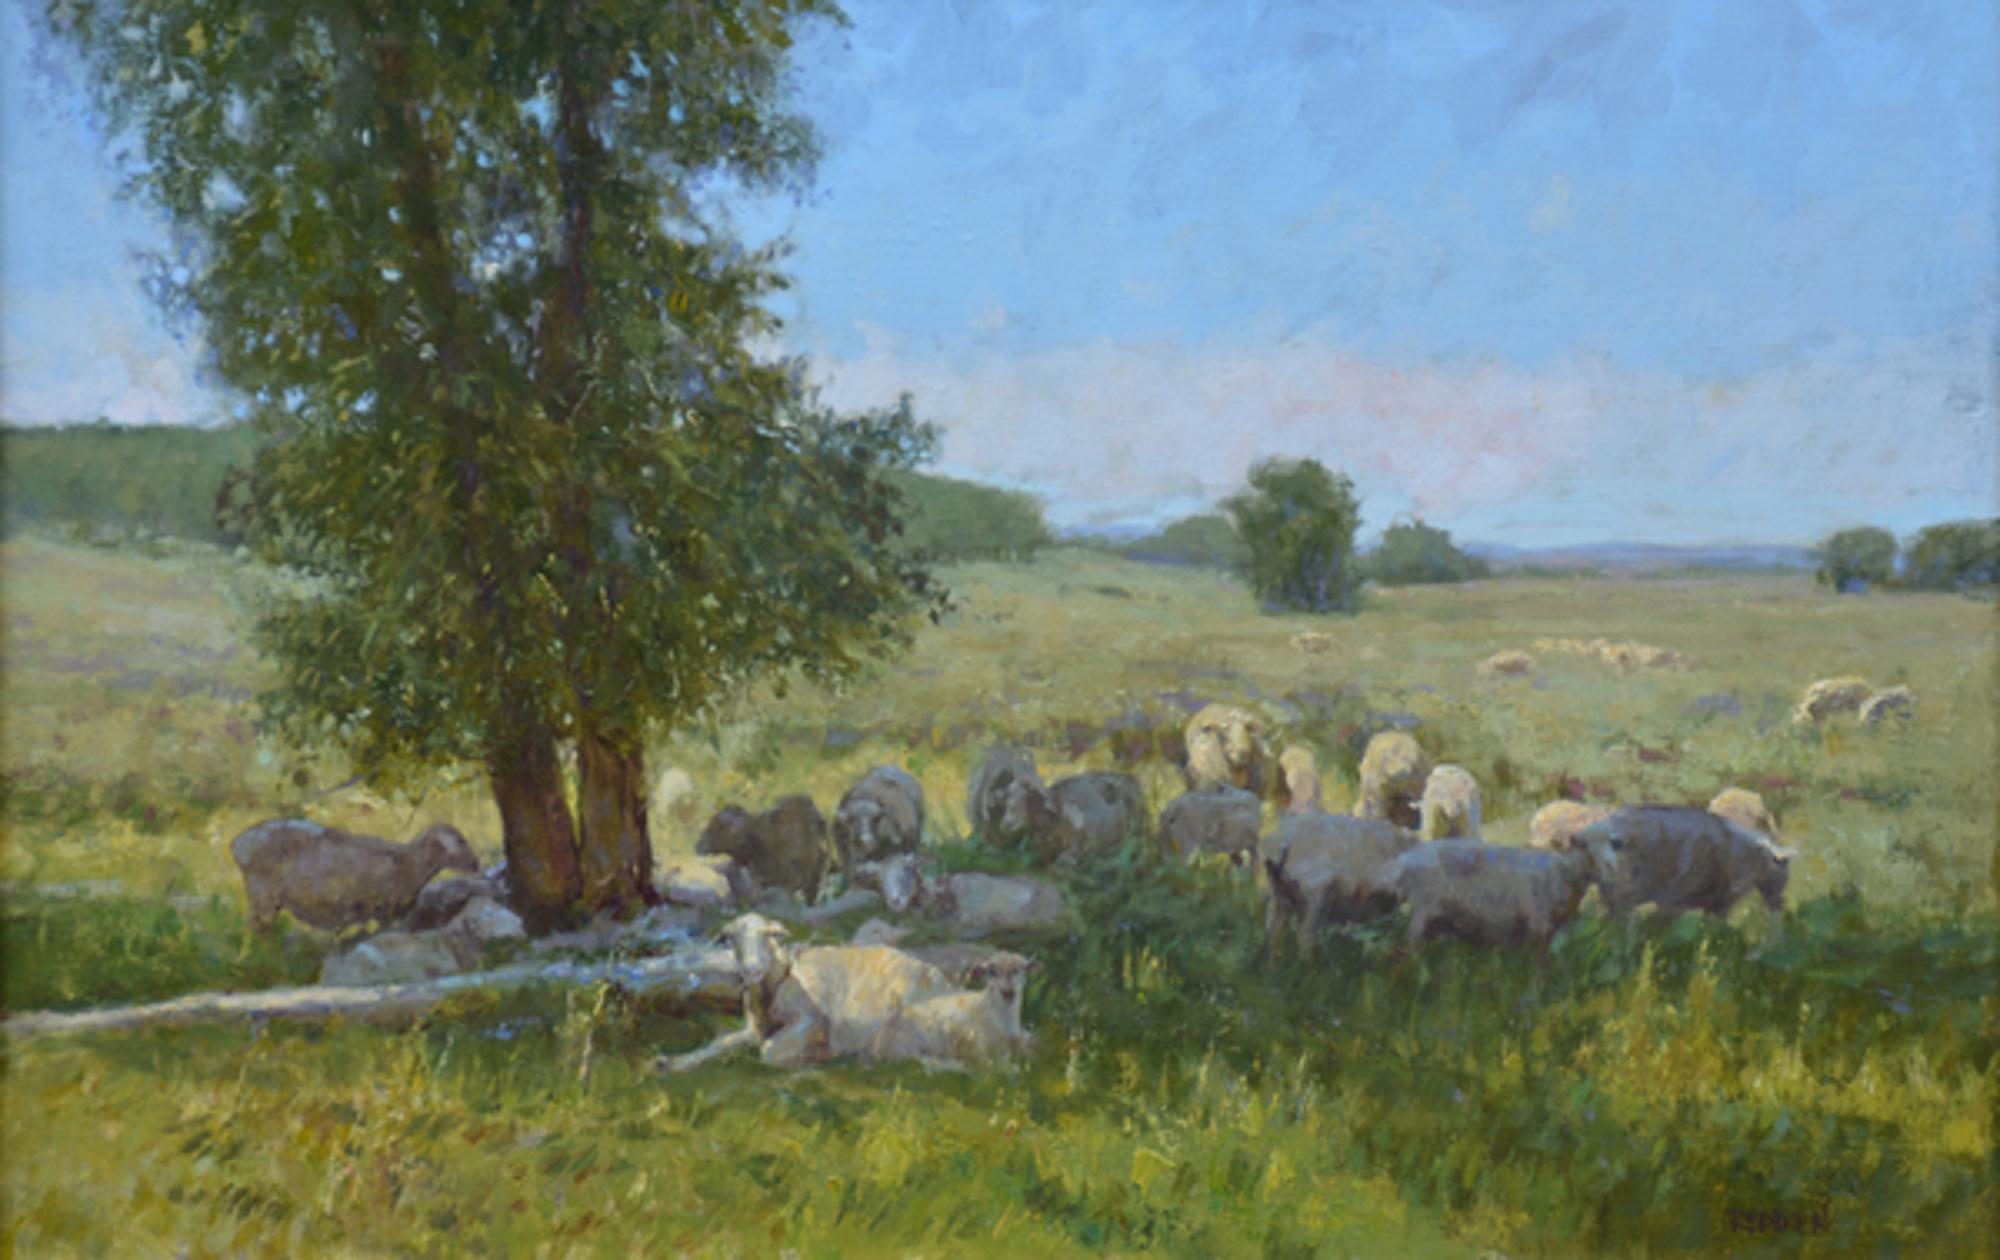 Resting in 29 by Grant Redden